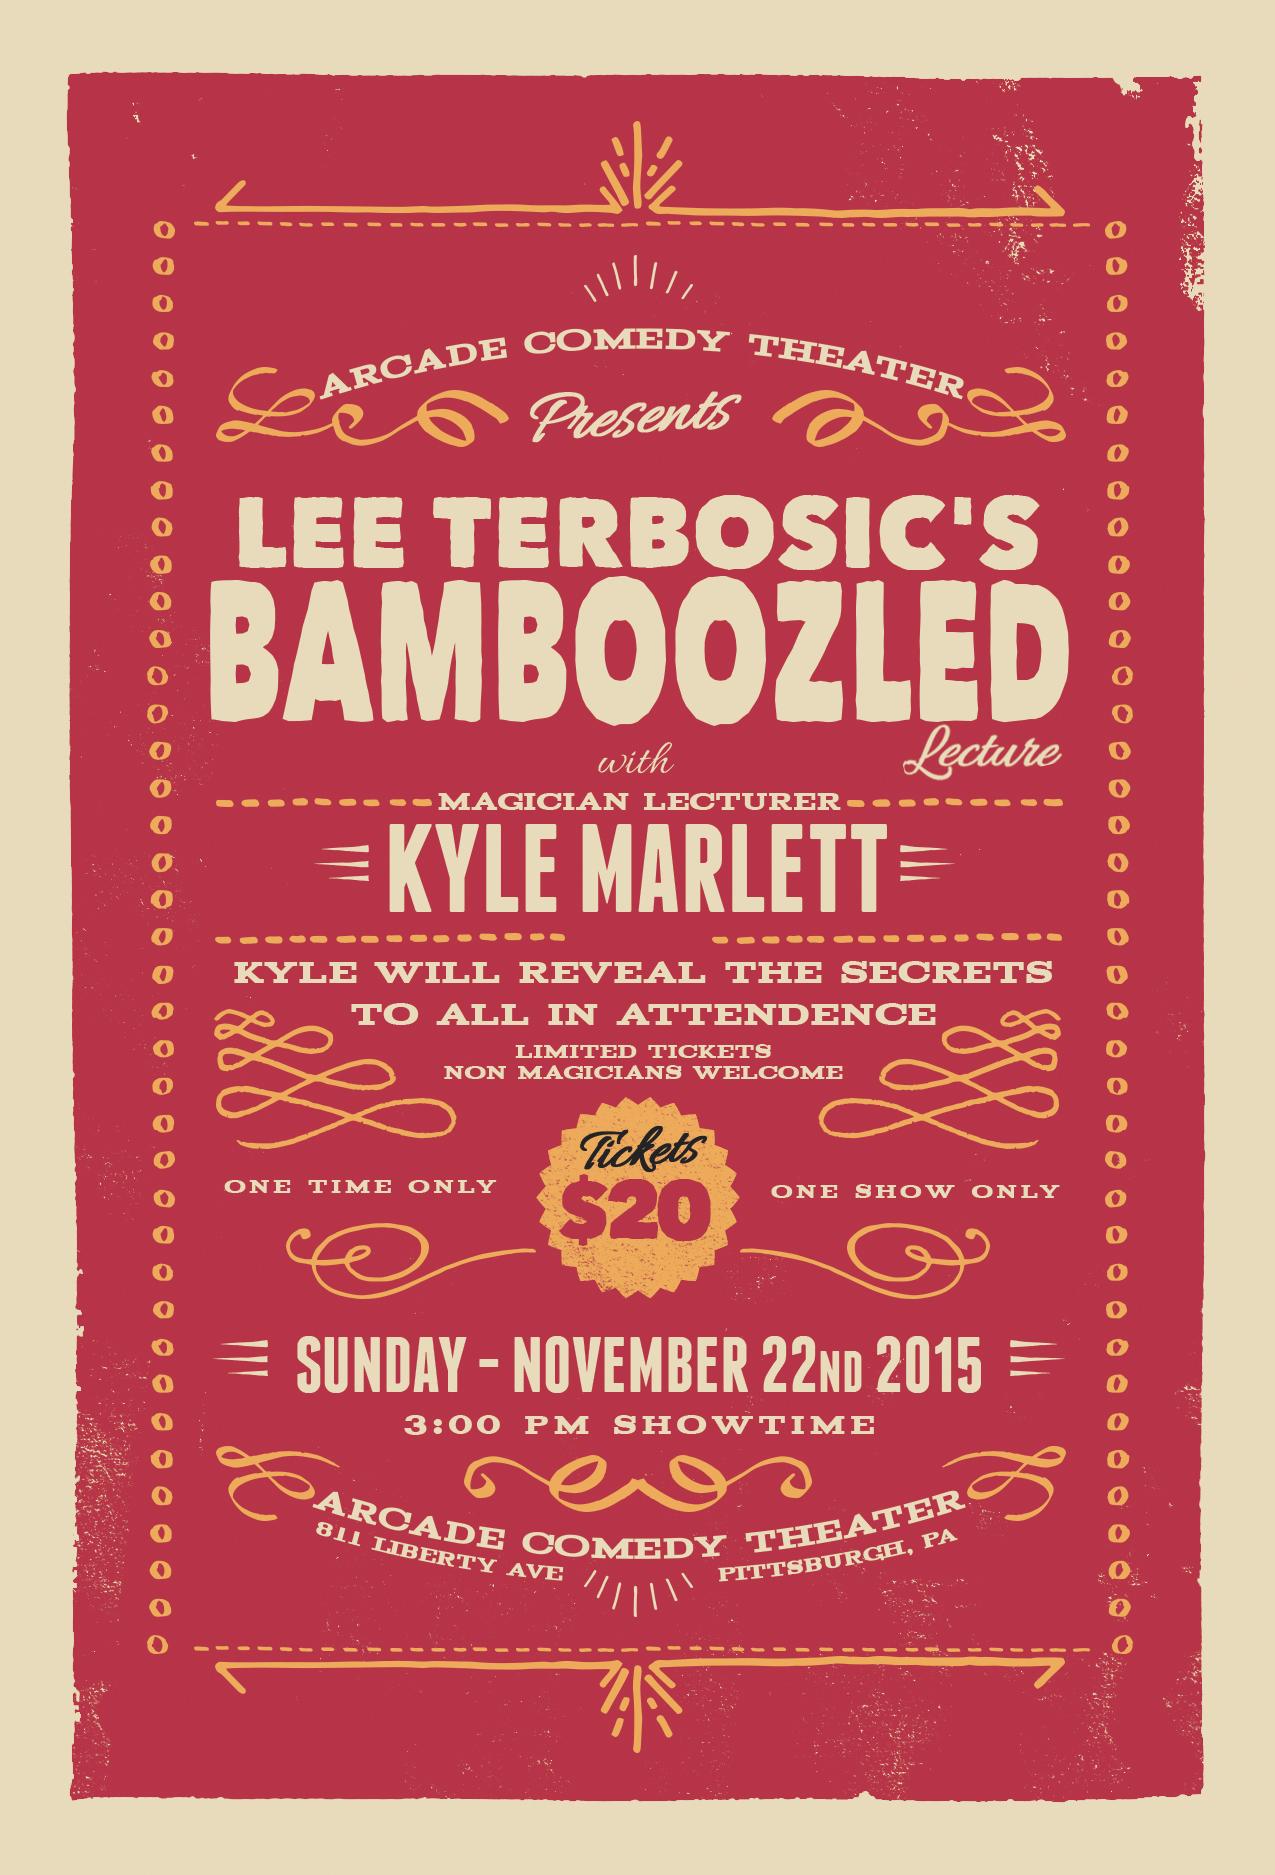 Bamboozled-Lecture-11-22-15-Kyle Marlett-4X6 Flyer.jpg